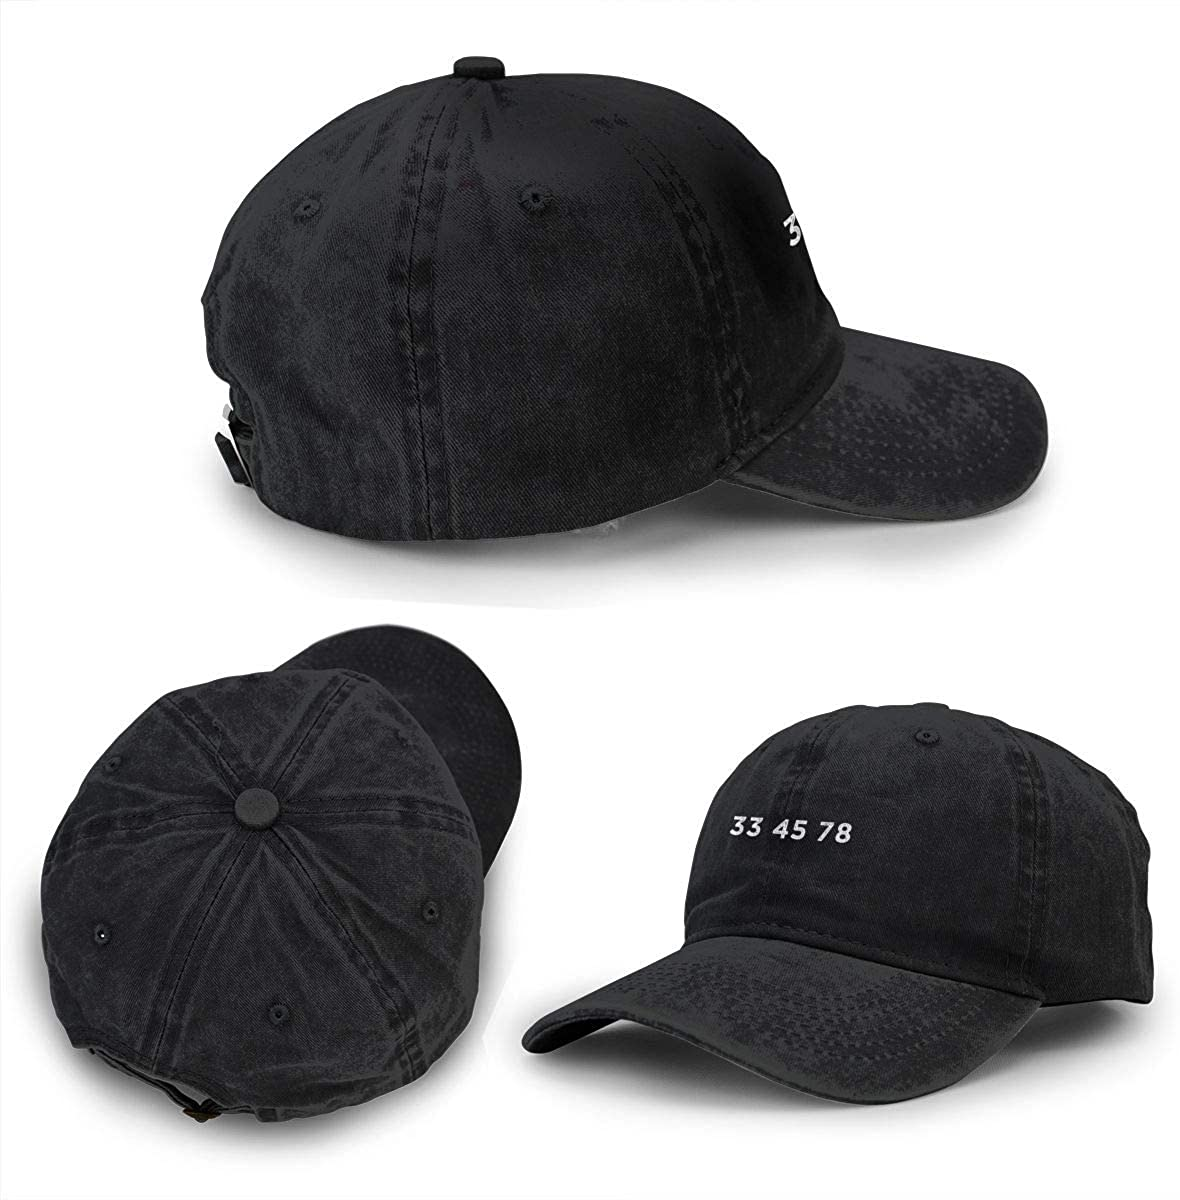 33 45 78 RPM Cowboy Baseball Caps Denim Hats for Men Women